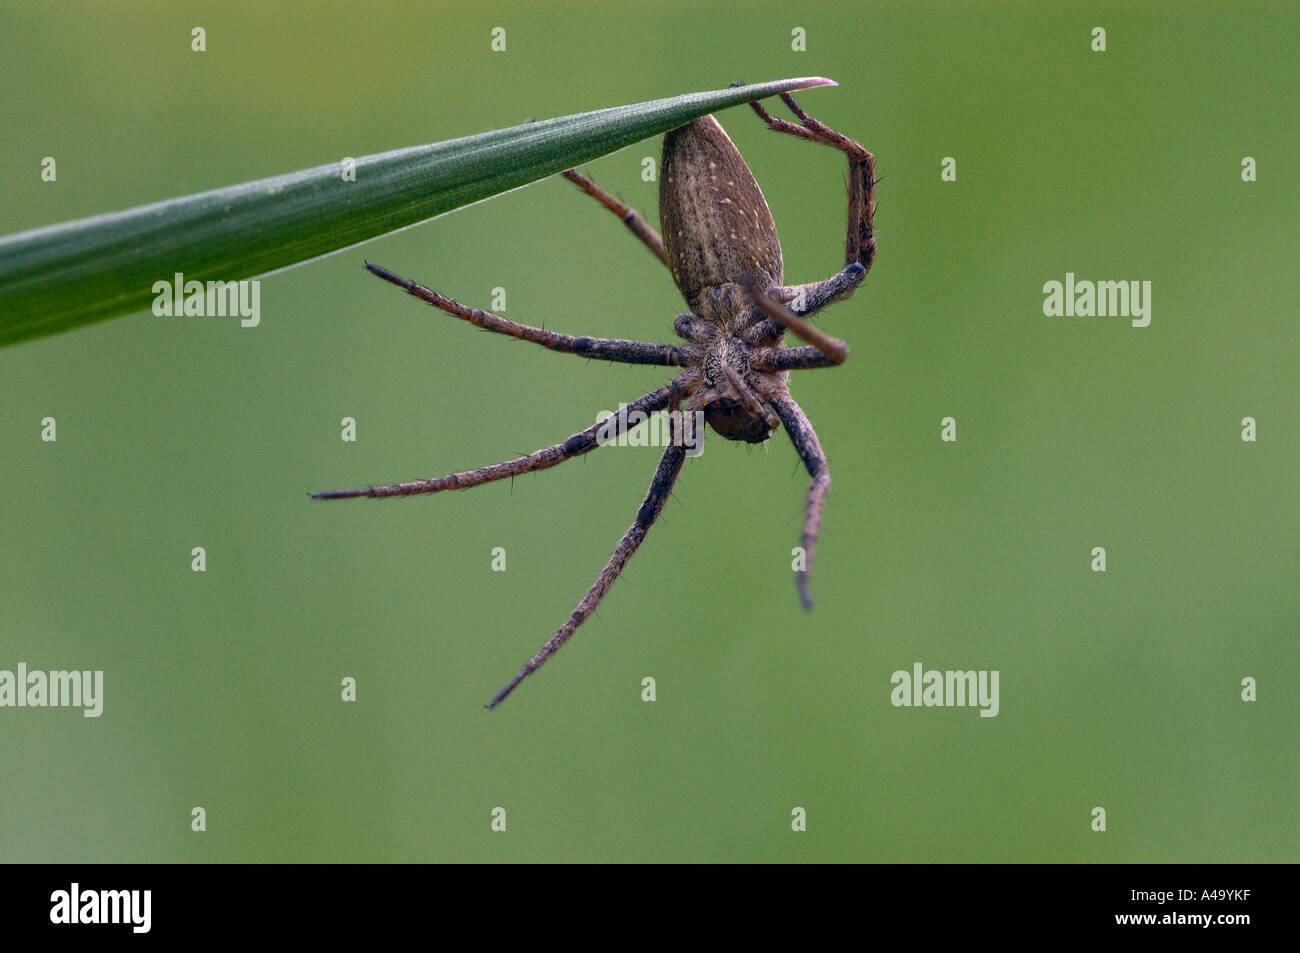 Spider pêche fantastique Photo Stock